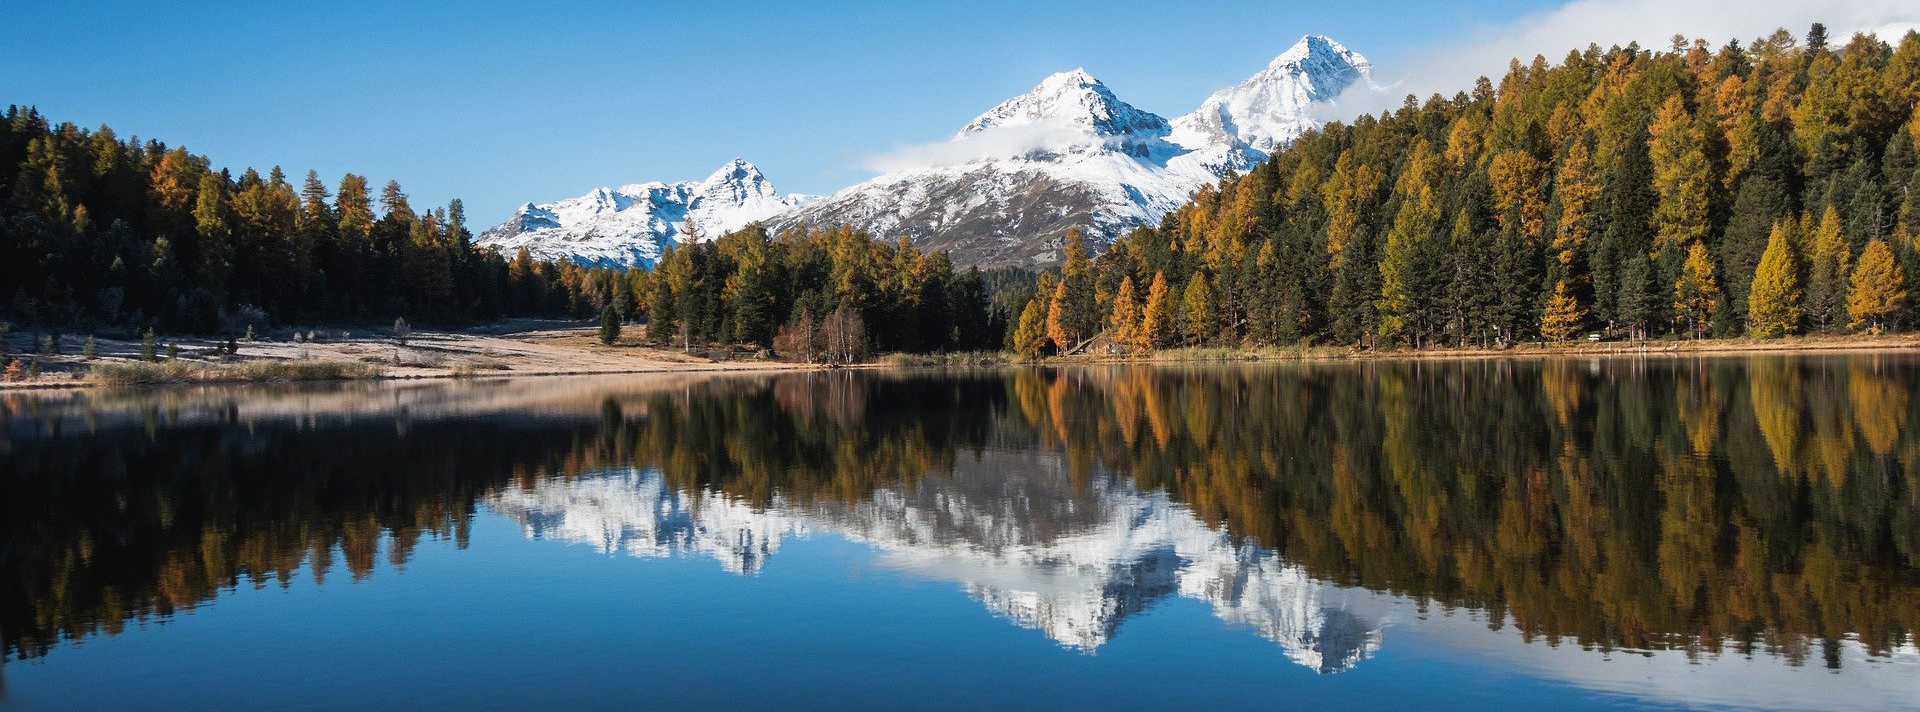 Schweiz Blog